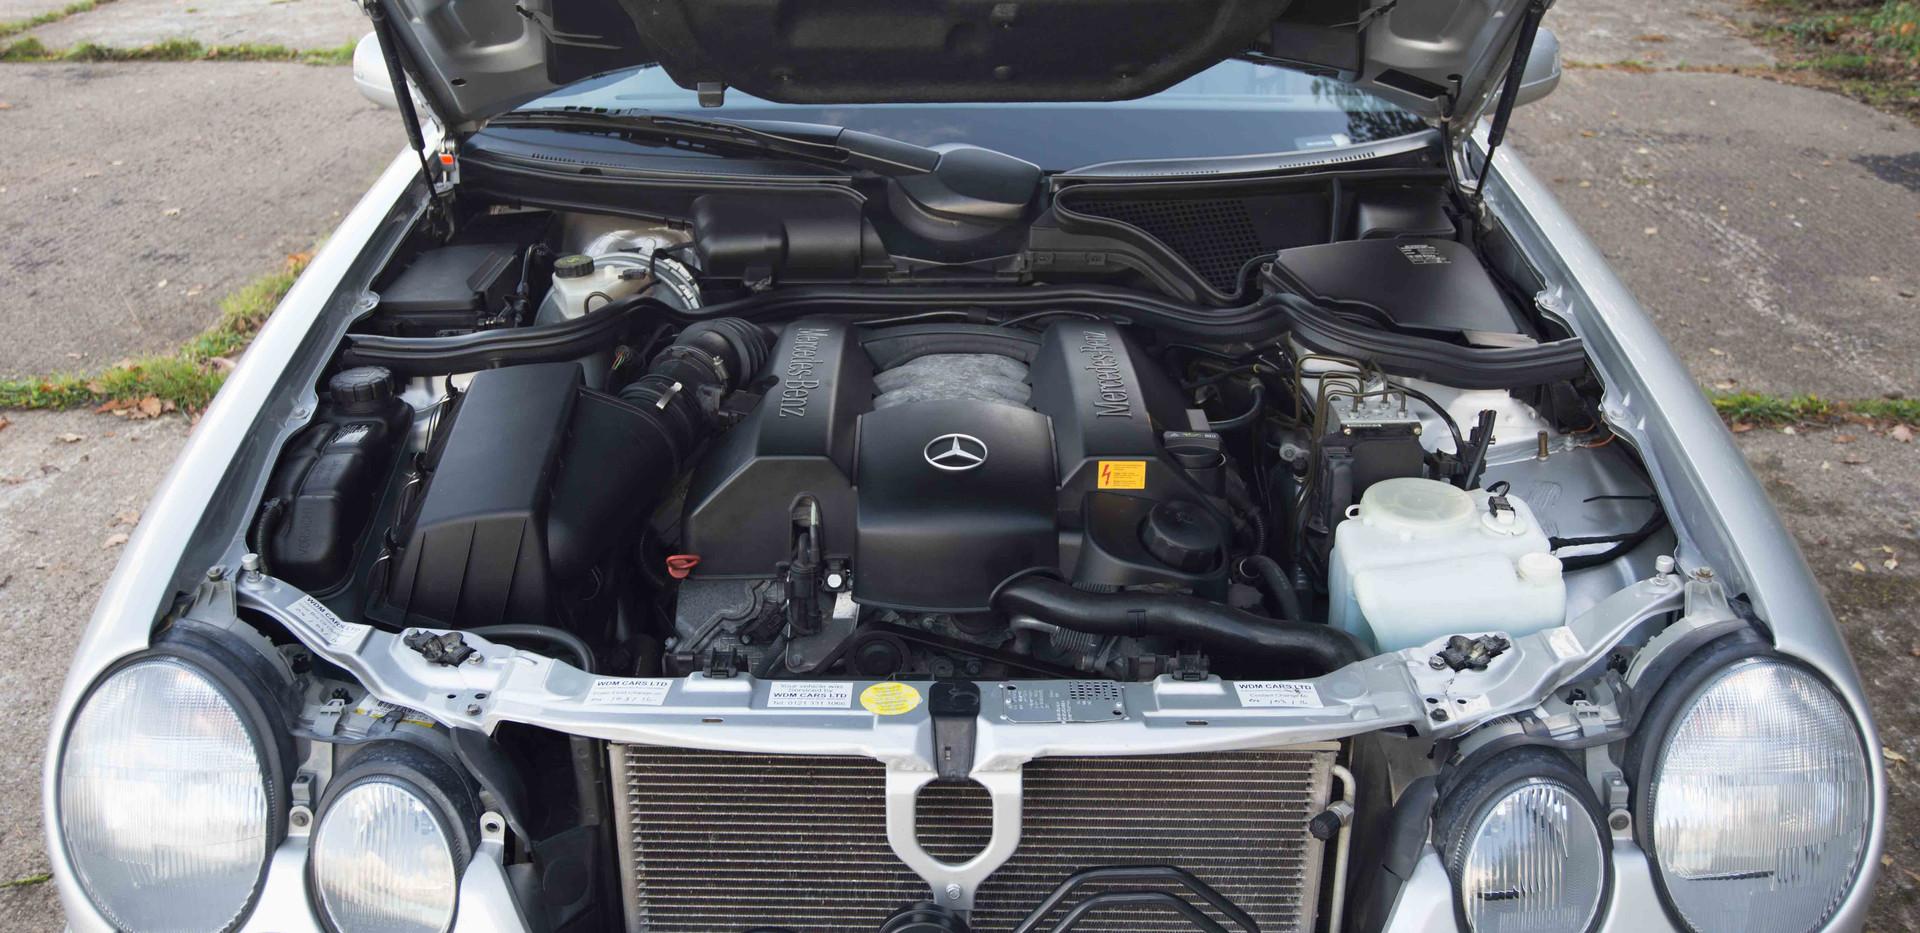 Mercedes E240 For Sale UK London  (79 of